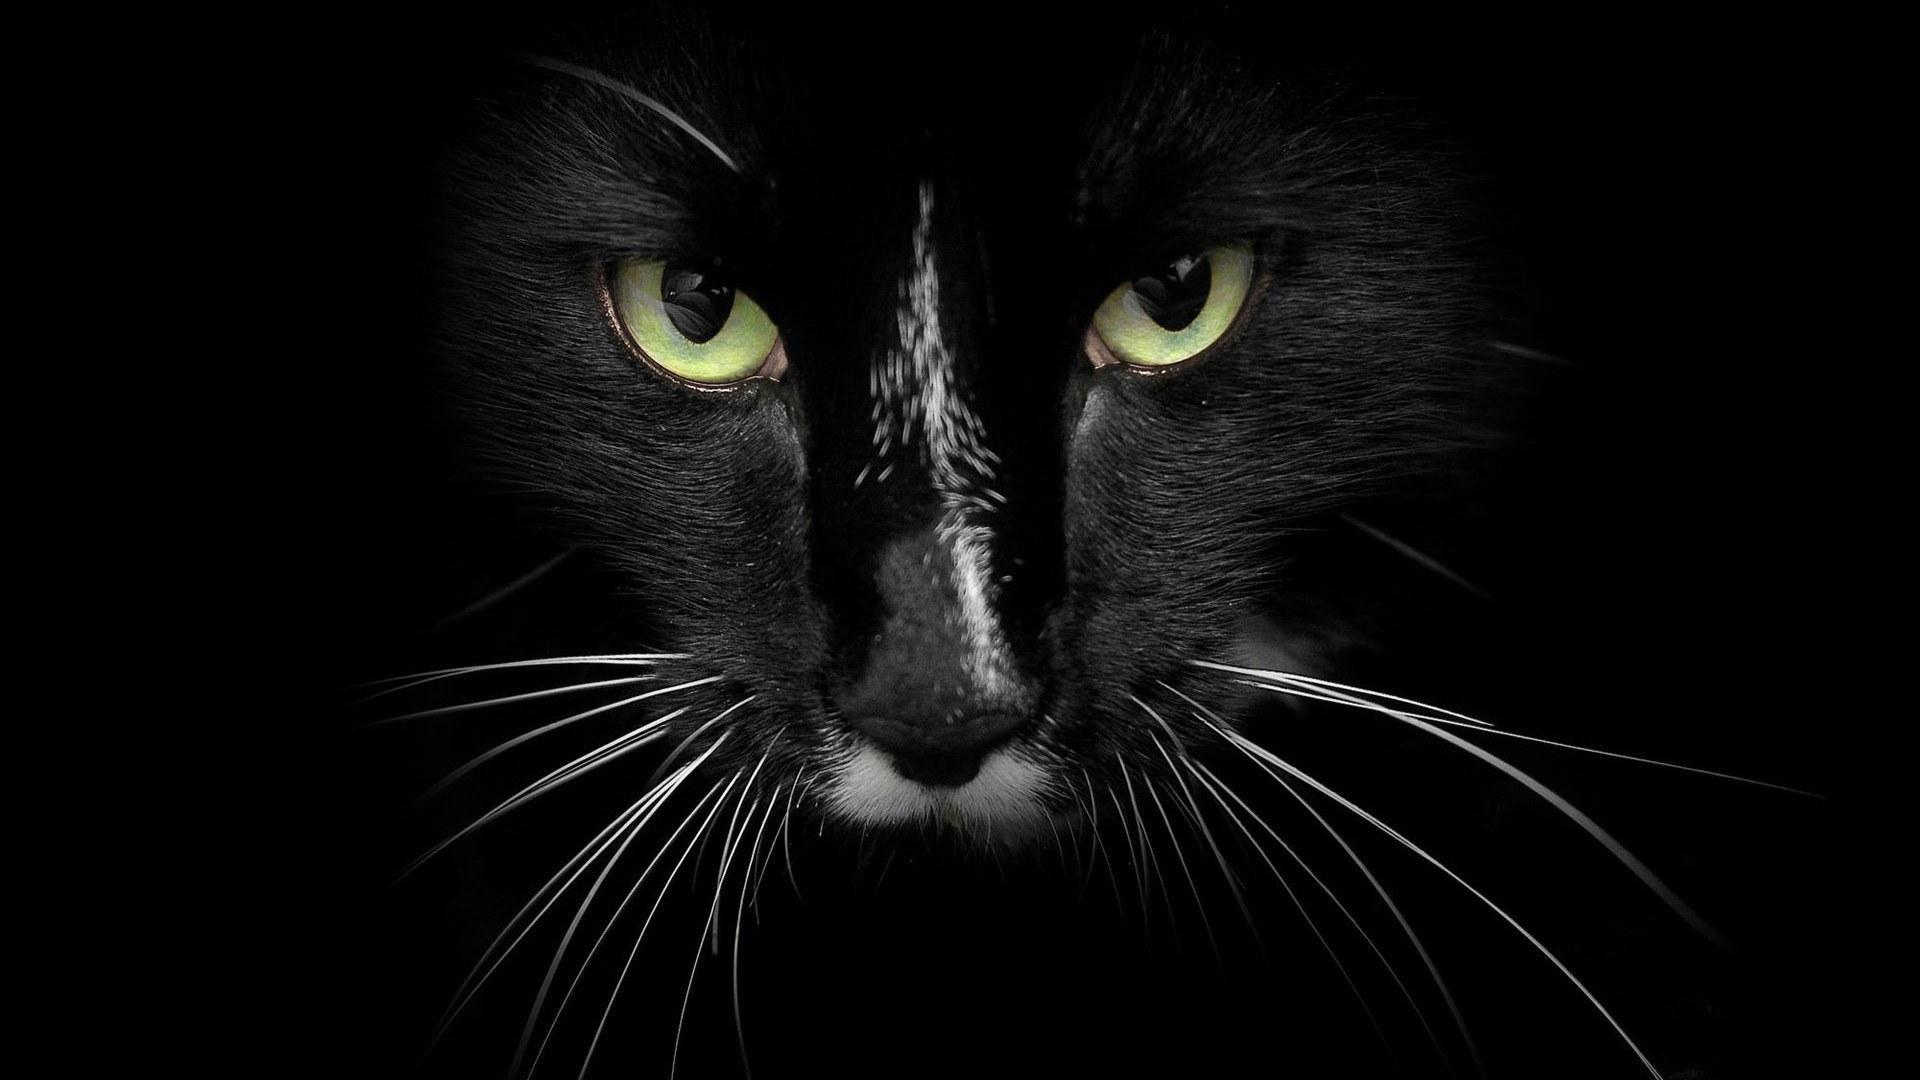 Black Cat desktop background hd